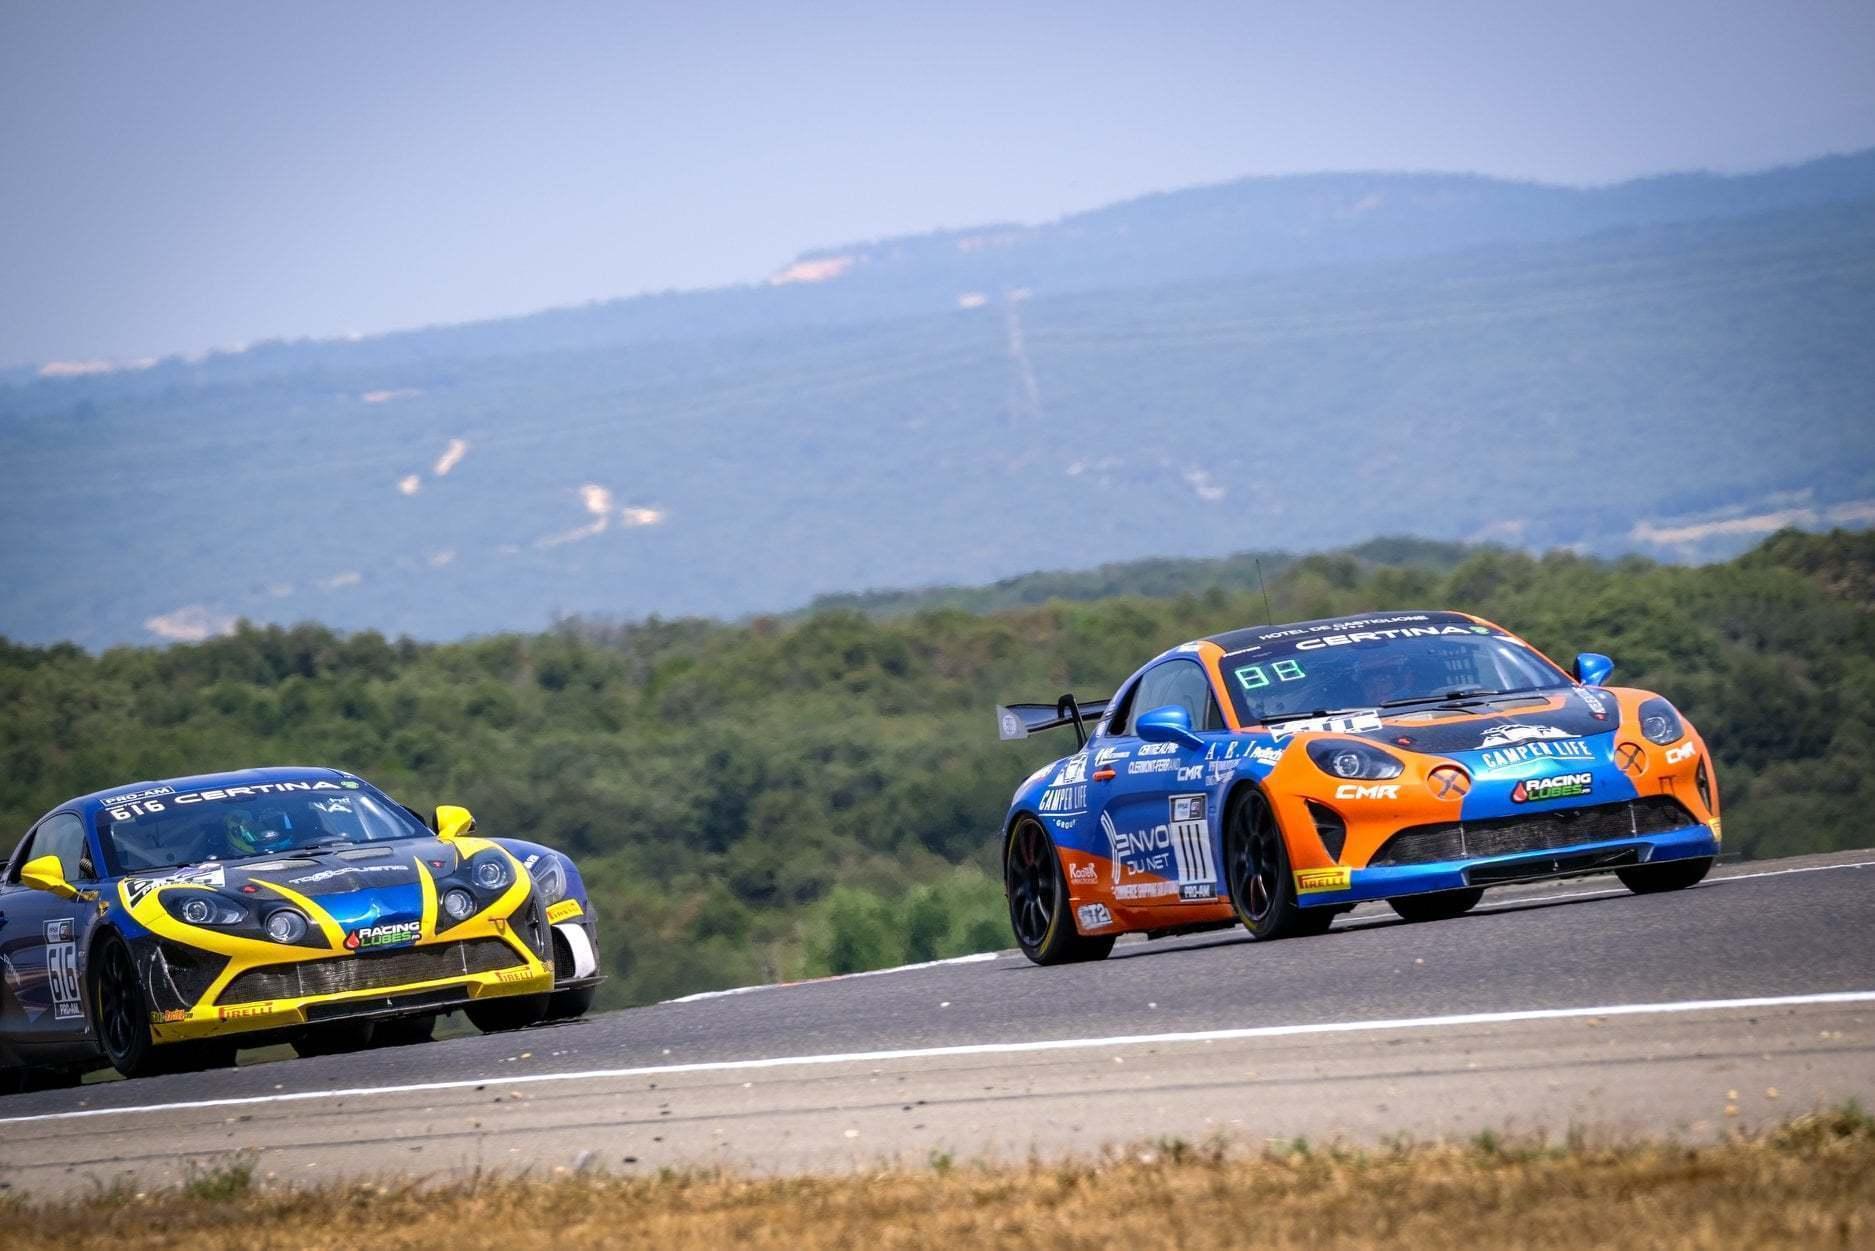 FFSA GT: CMR reprend la main Lédenon ! (Course 2) 20